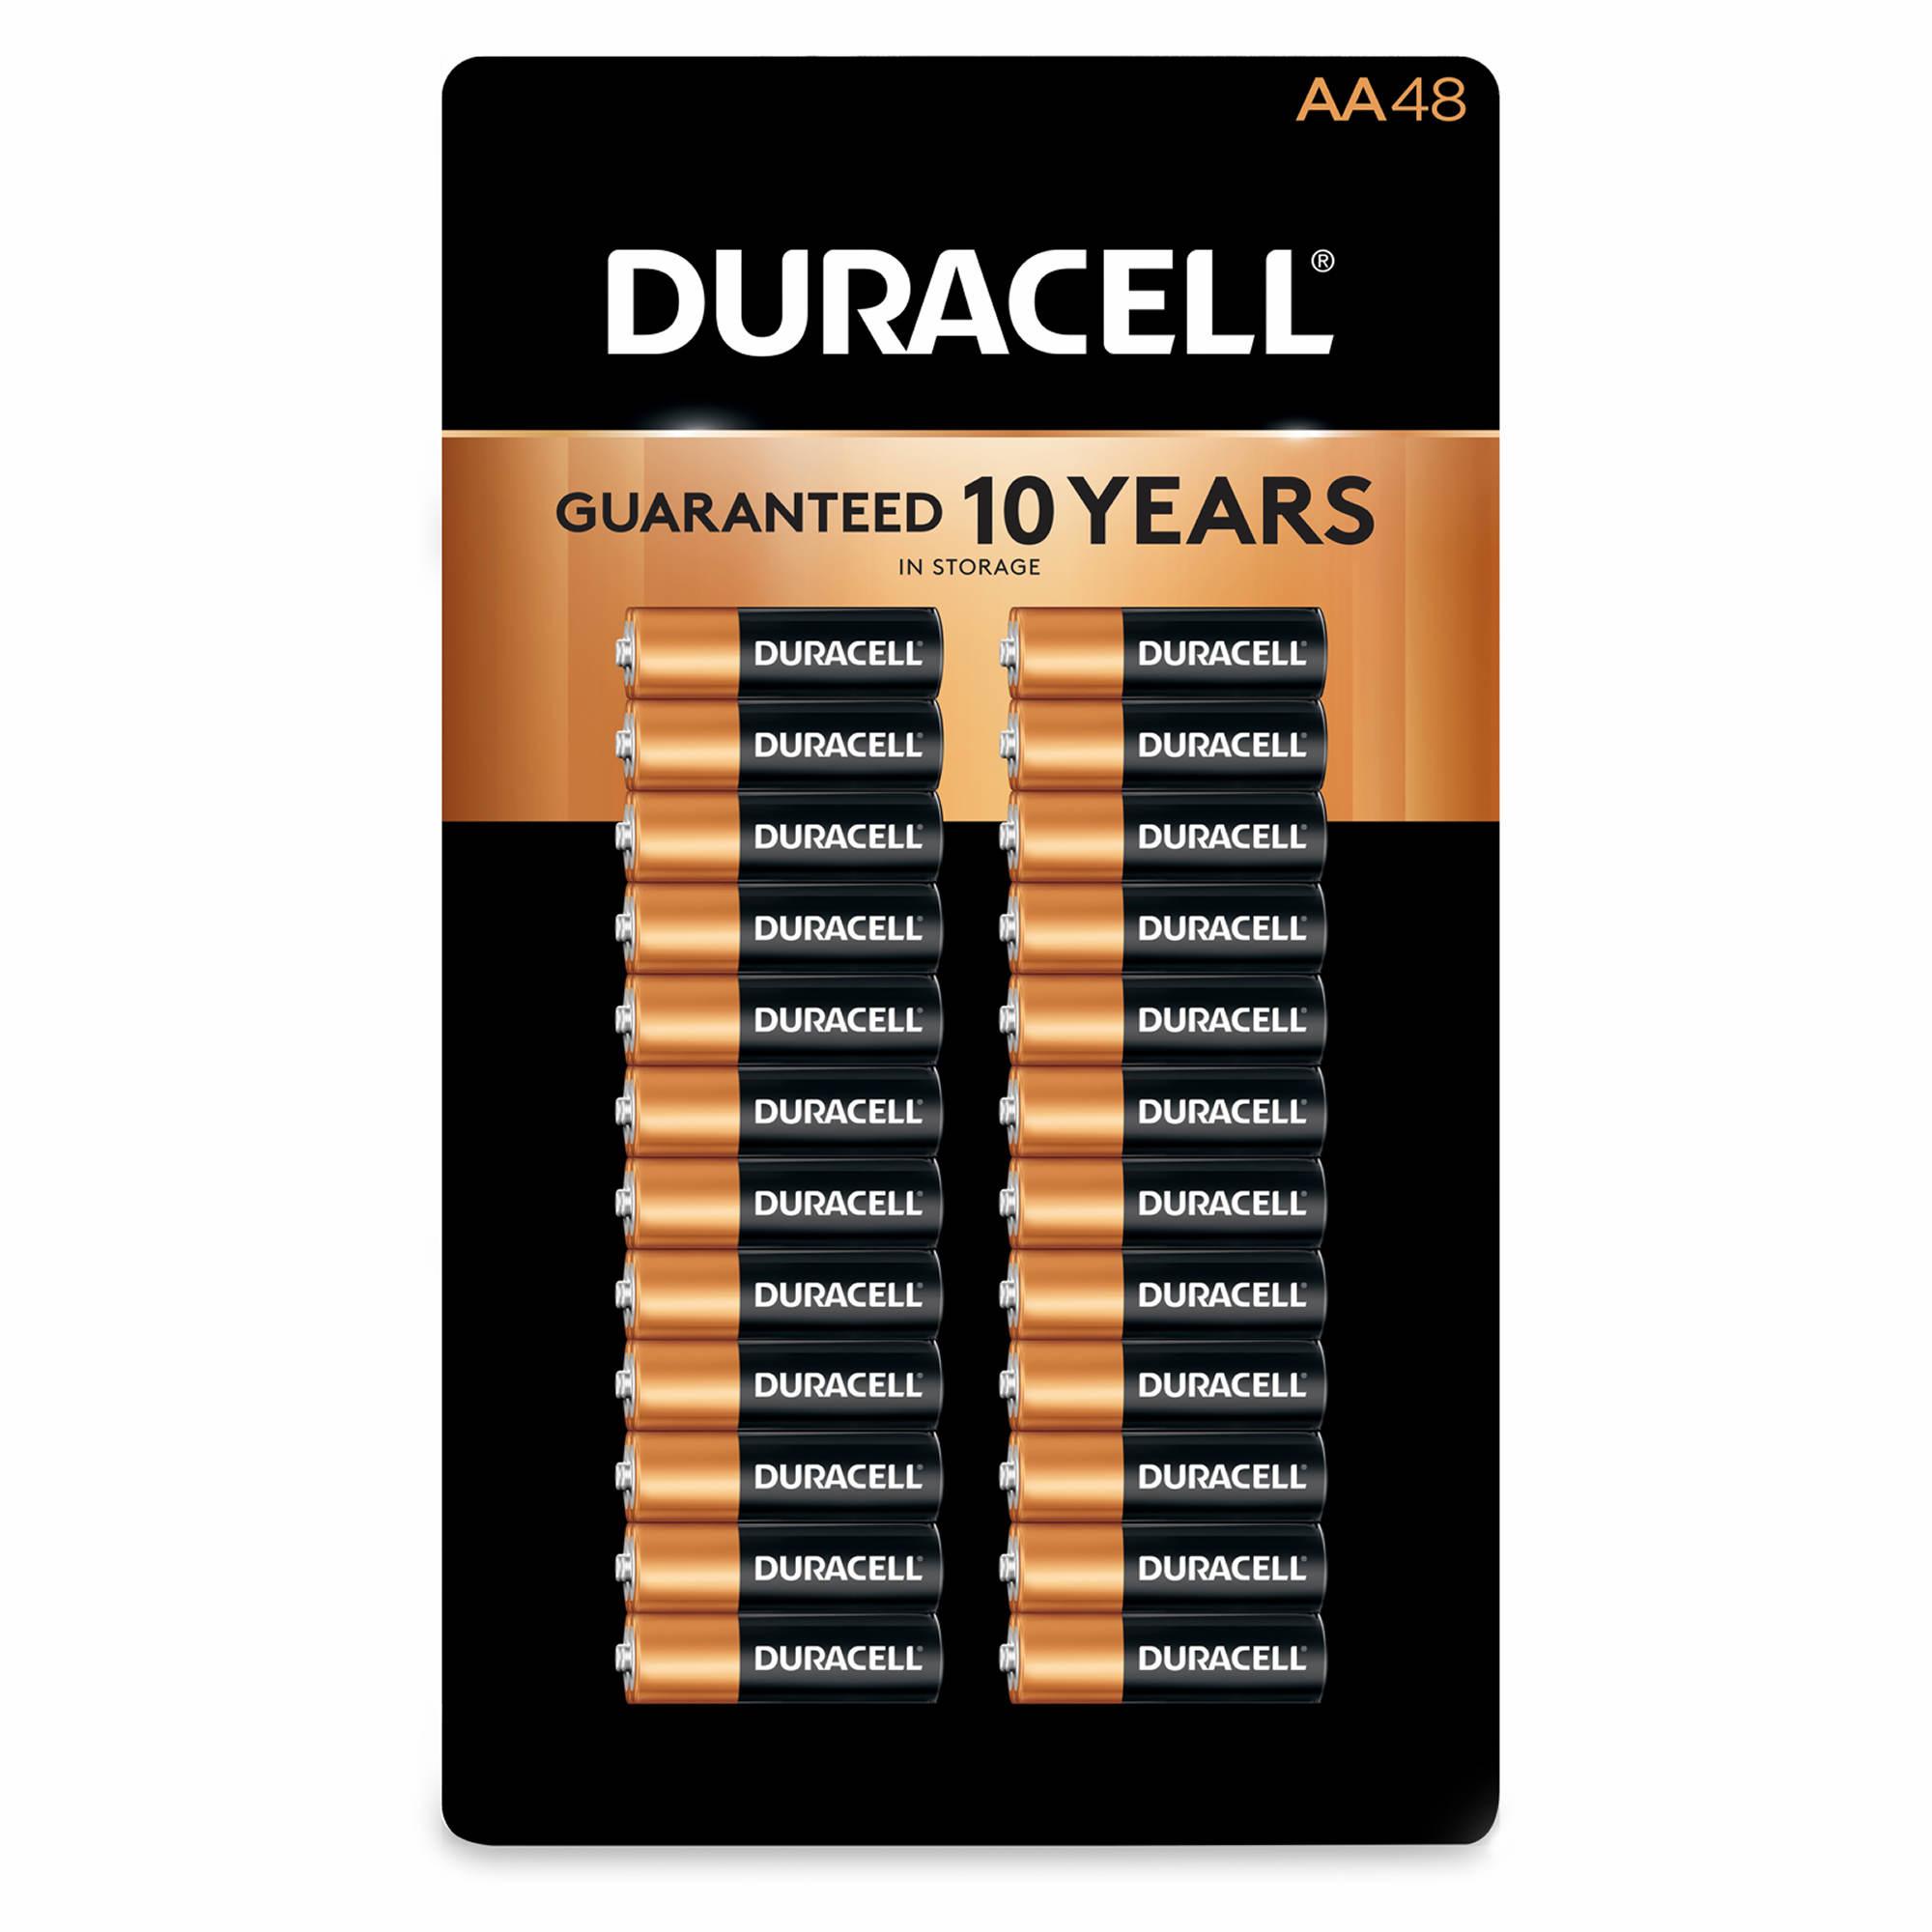 Duracell CopperTop AA Batteries, 48 ct. - BJs WholeSale Club